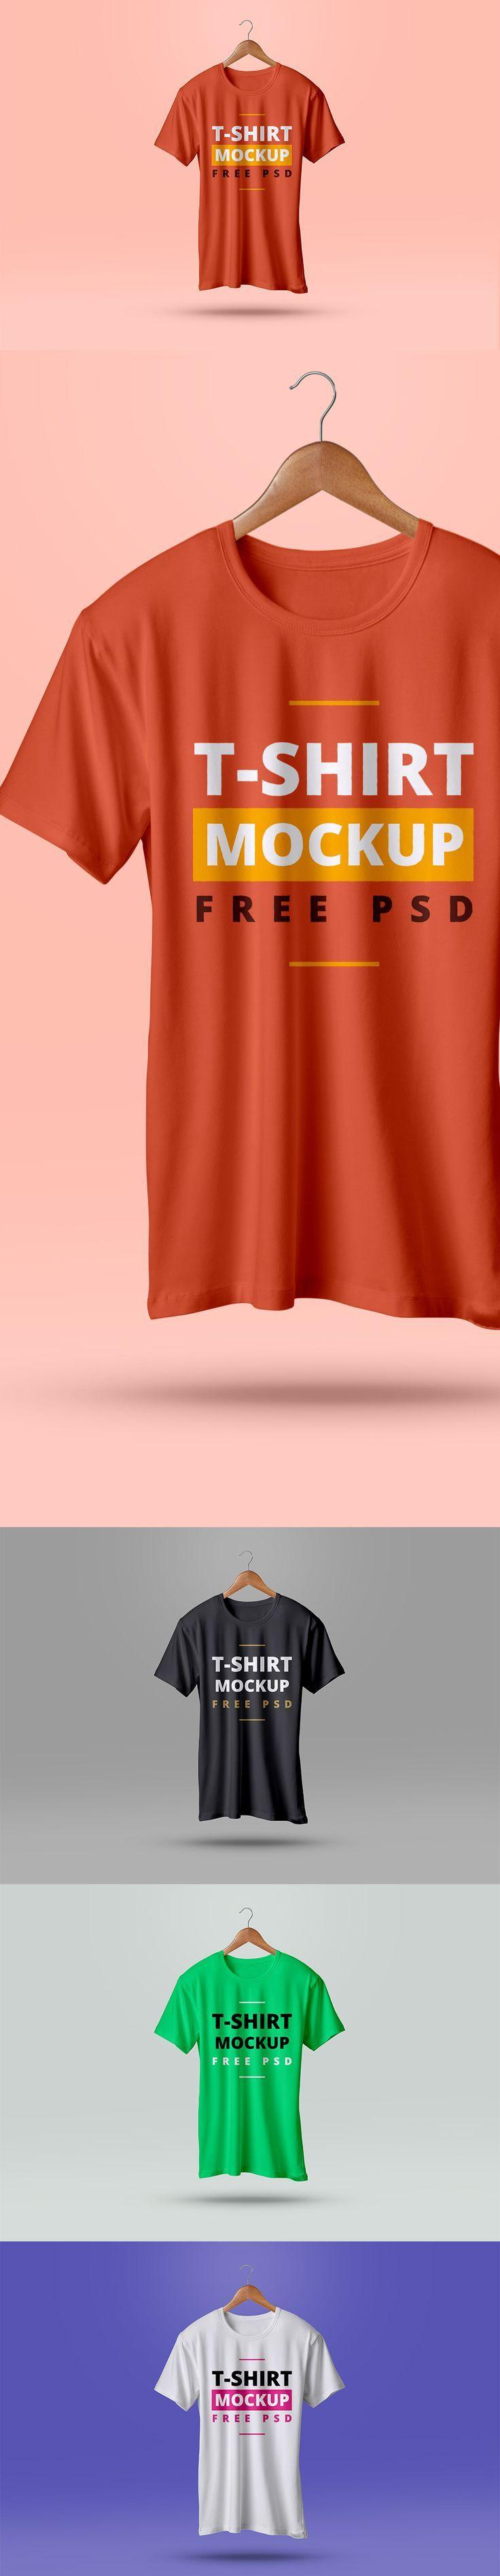 T-Shirt Mockup PSD - GraphicsFuel